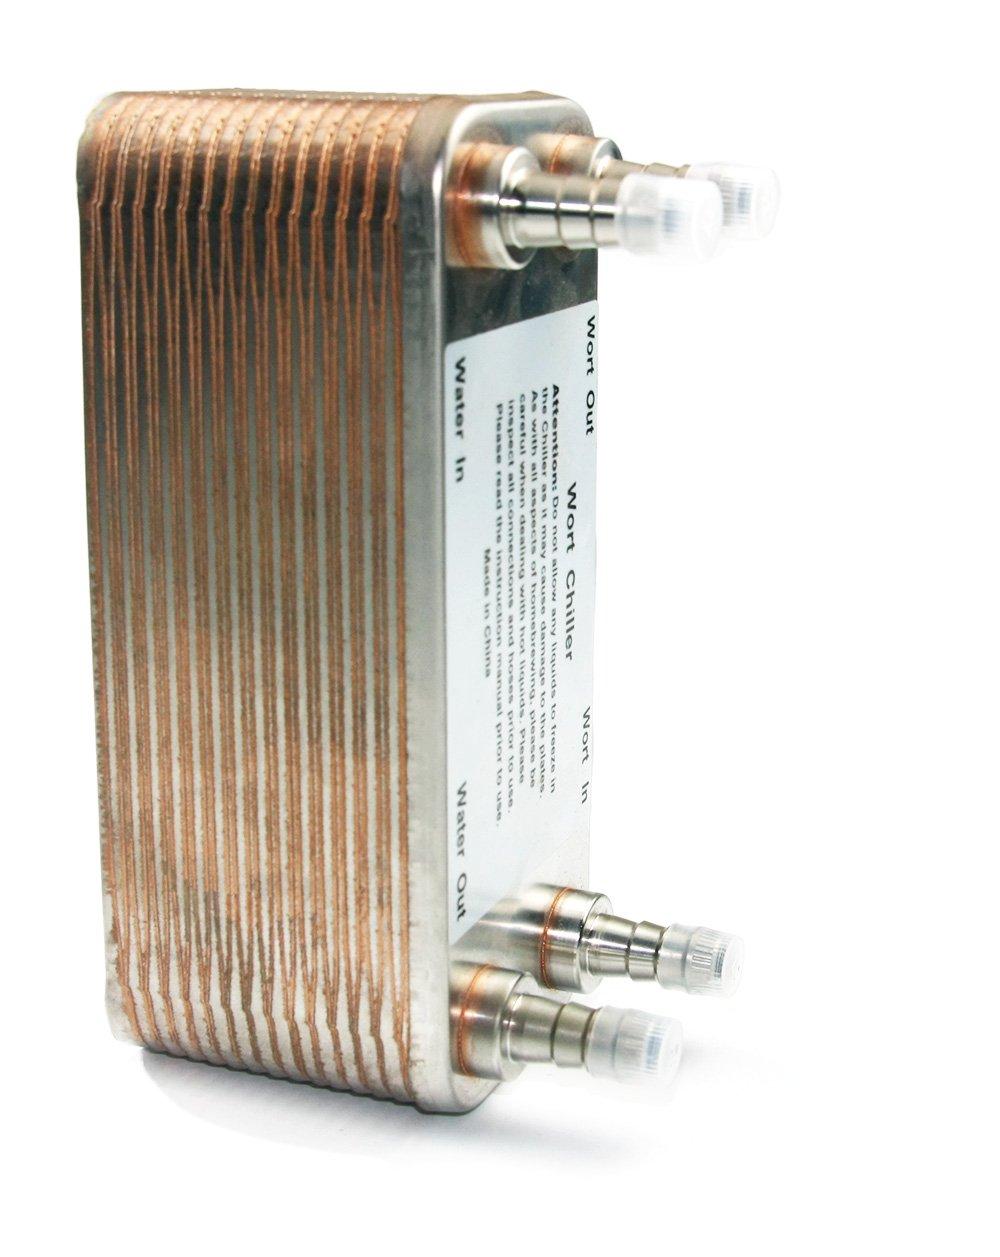 Brazed 50 Plates Heat Exchanger and Wort Chiller,50 Plates Wort Chiller R 3/4